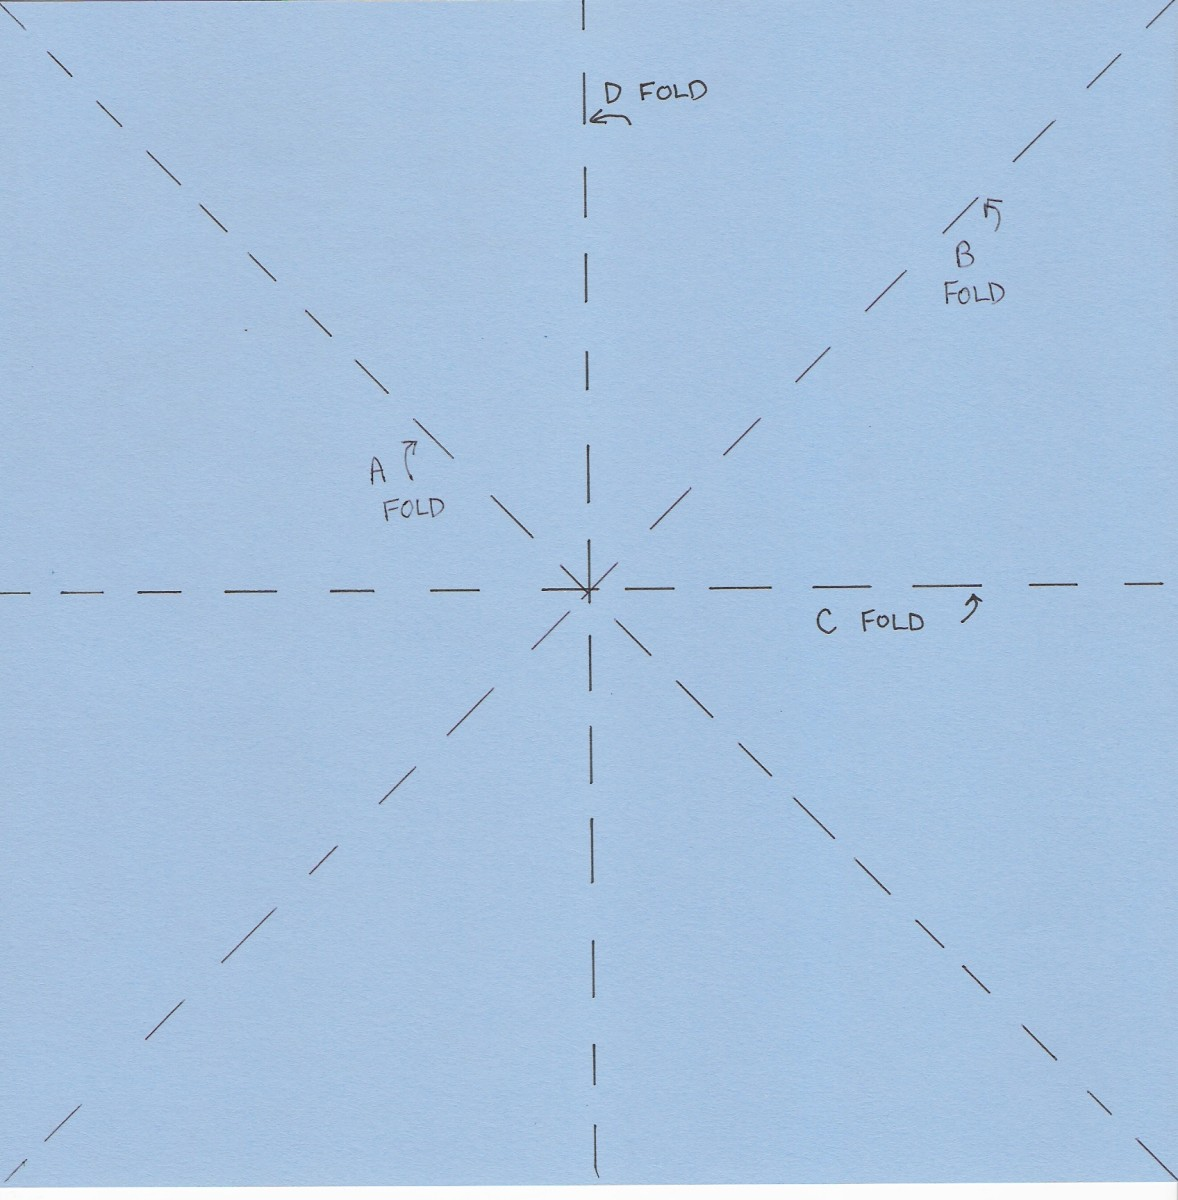 Fold paper in half , unfold along C line. Then turn the paper a quarter turn and fold and unfold again along D line.